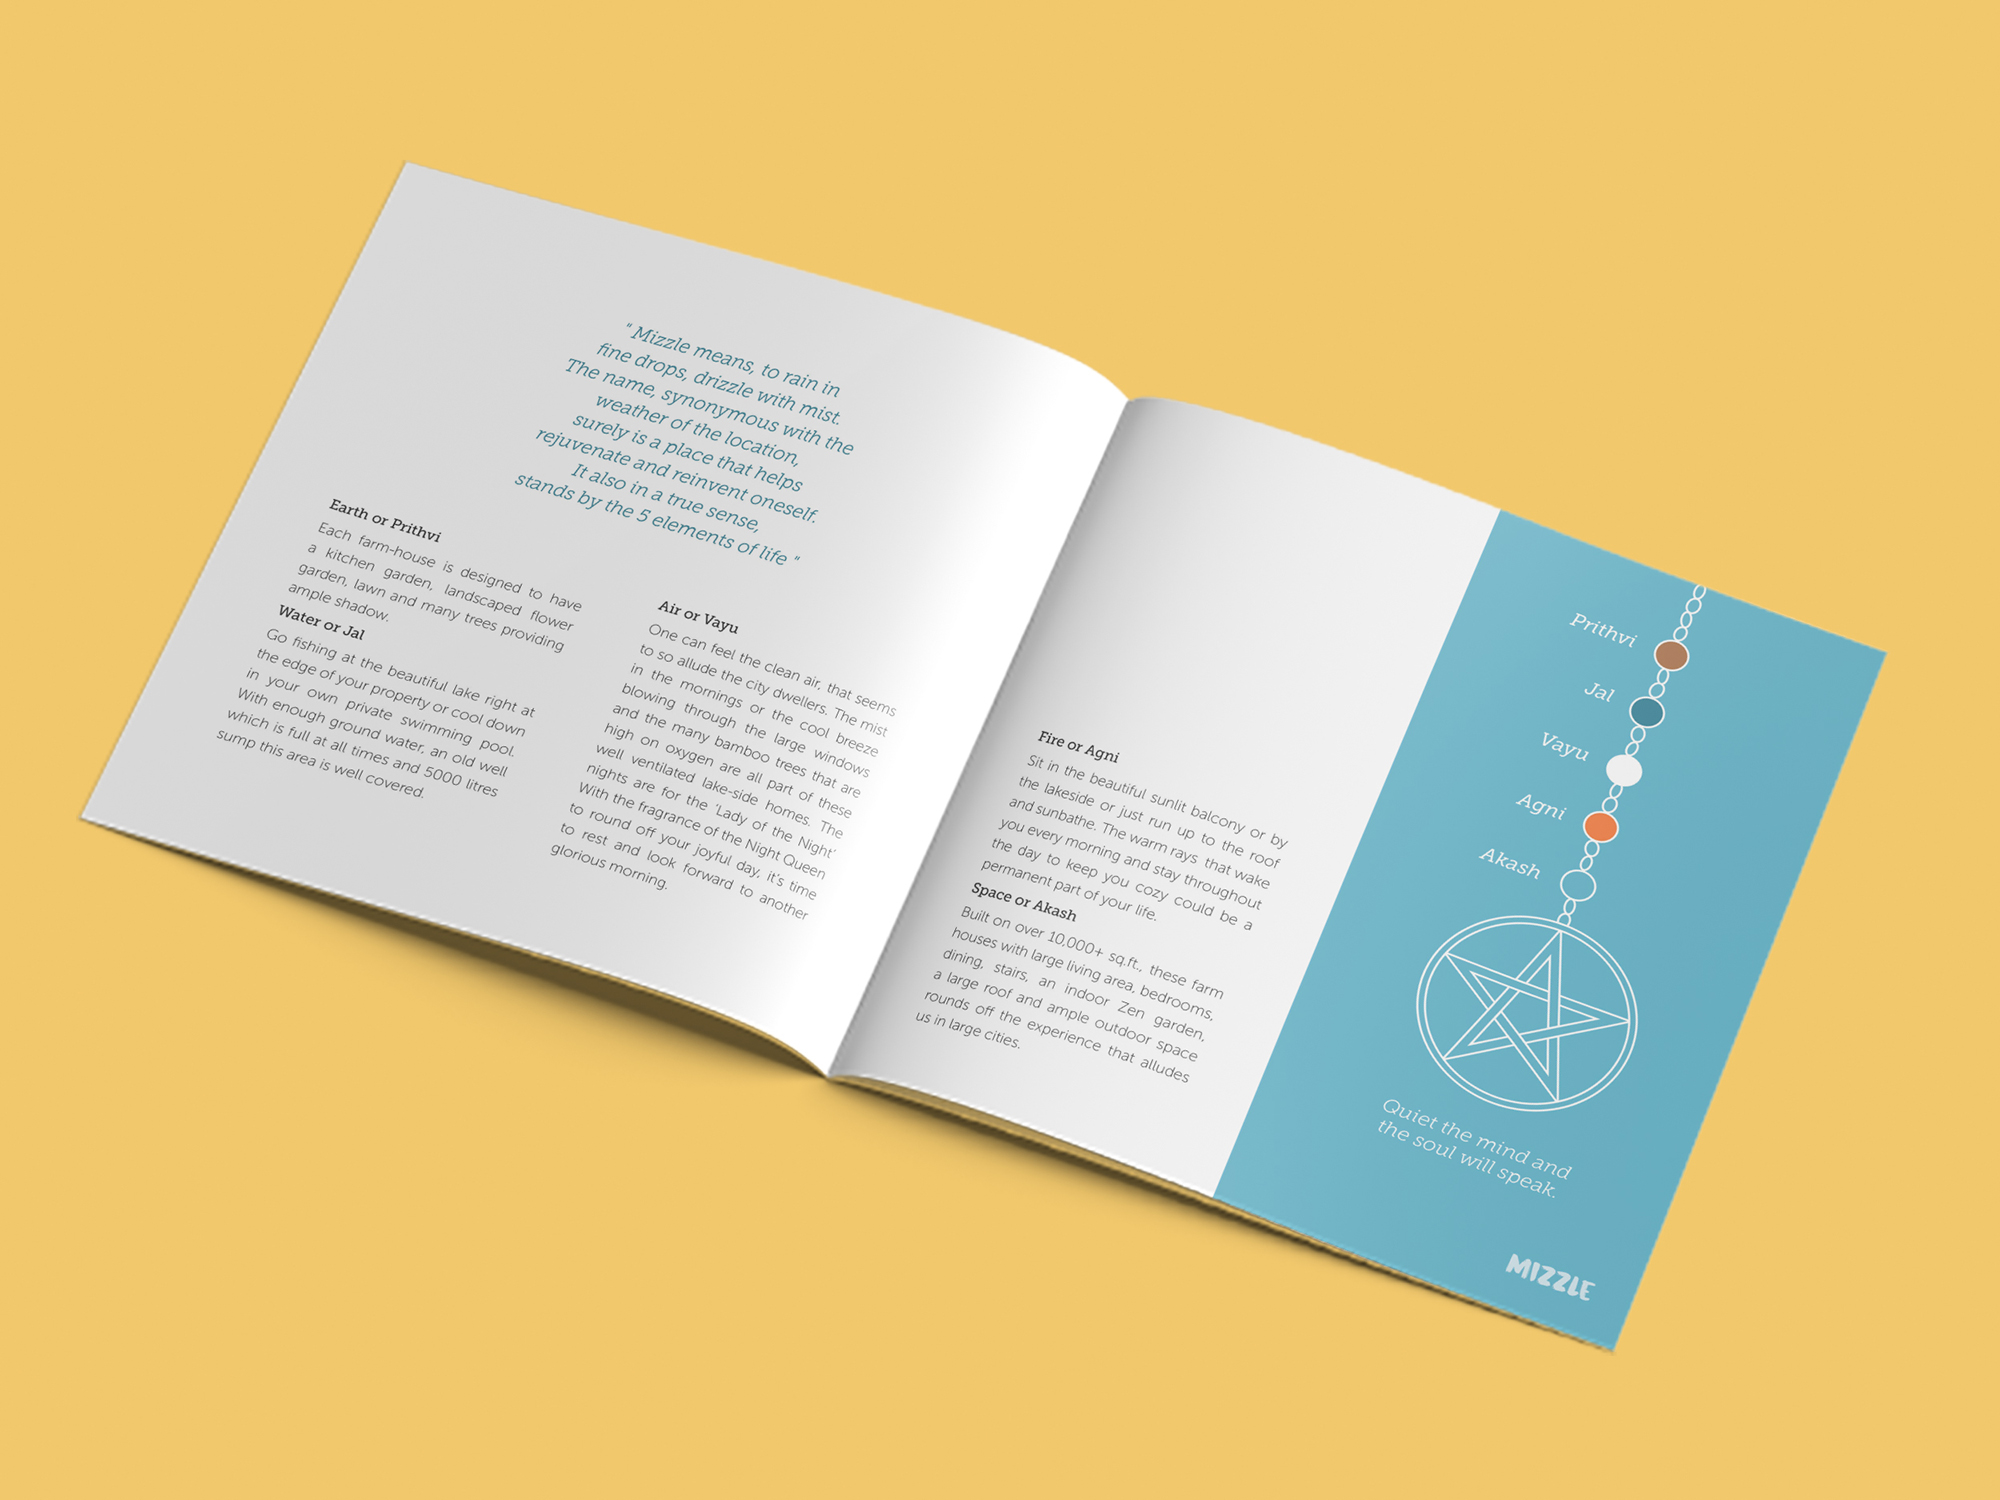 mizzle_brochure_3